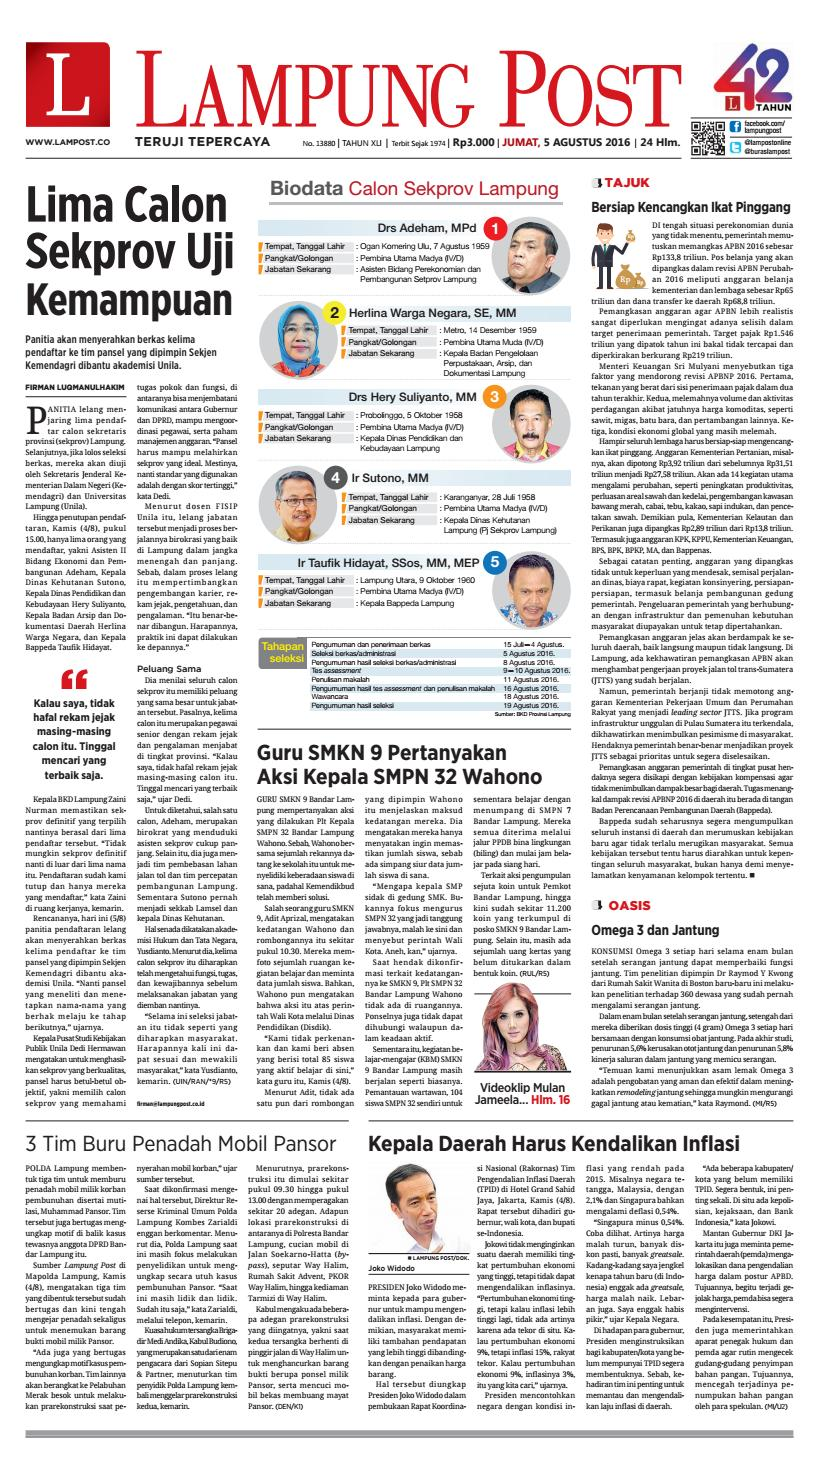 Lampung Post Jumat 5 Agustus 2016 By Issuu Produk Ukm Bumn Sulam Usus Pmk